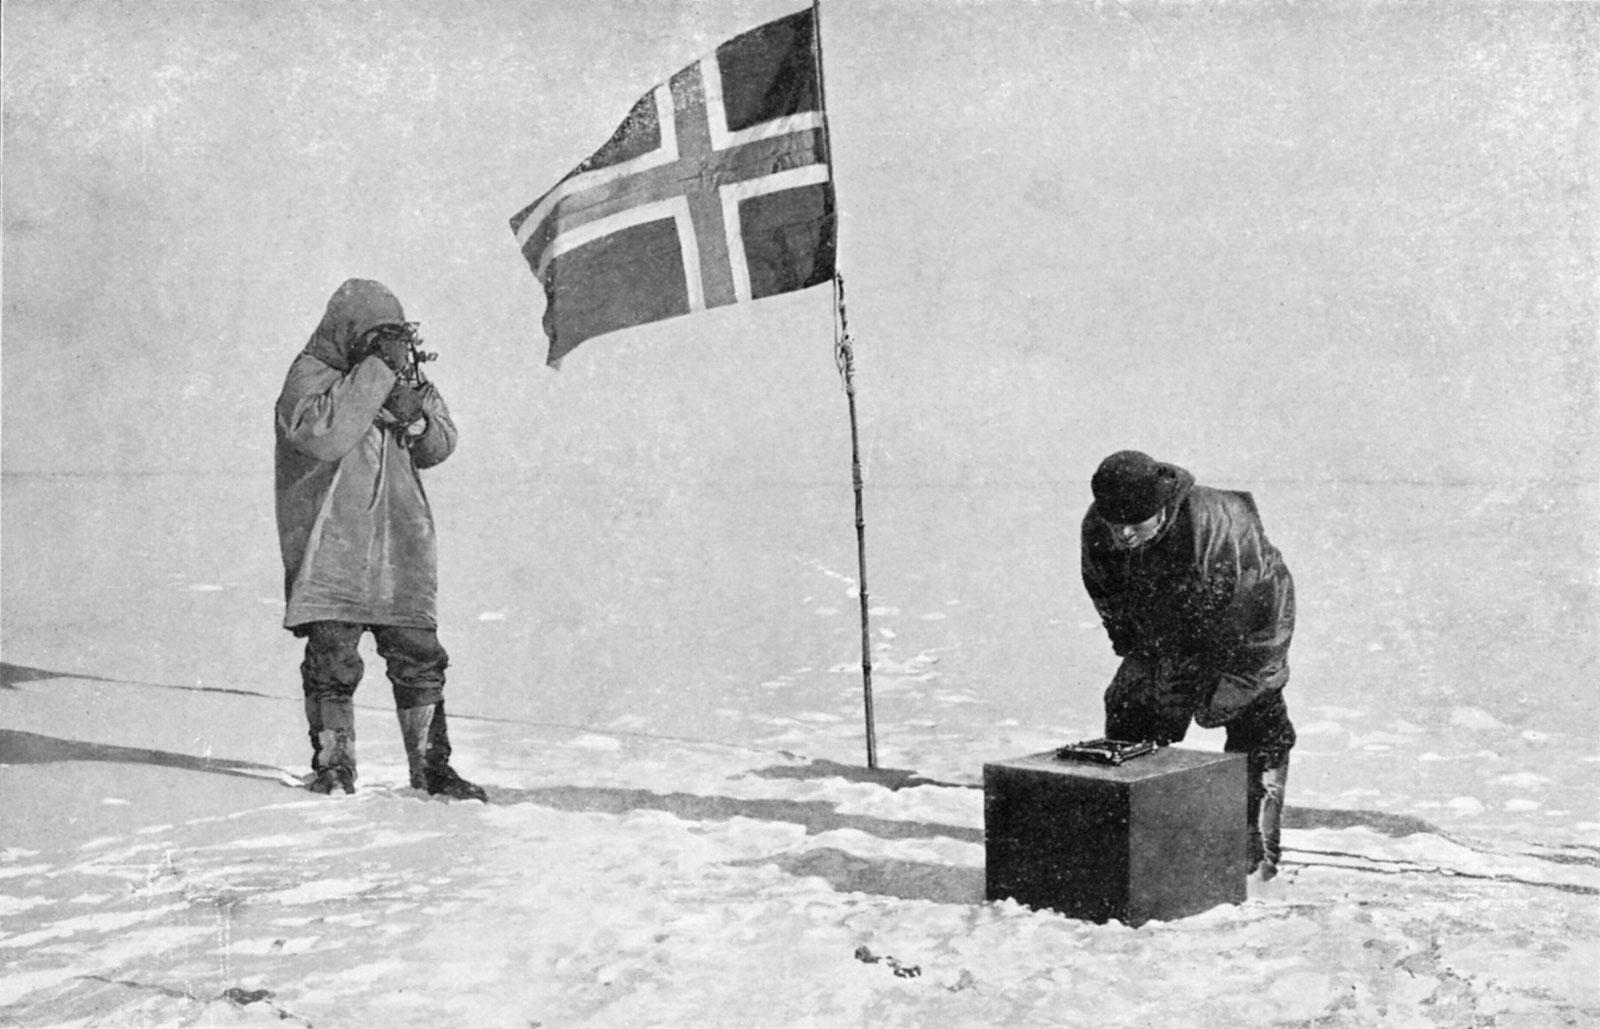 Roald-Engelbrecht-Gravning-Amundsen-Norwegian-explorer-South-Pole-1911